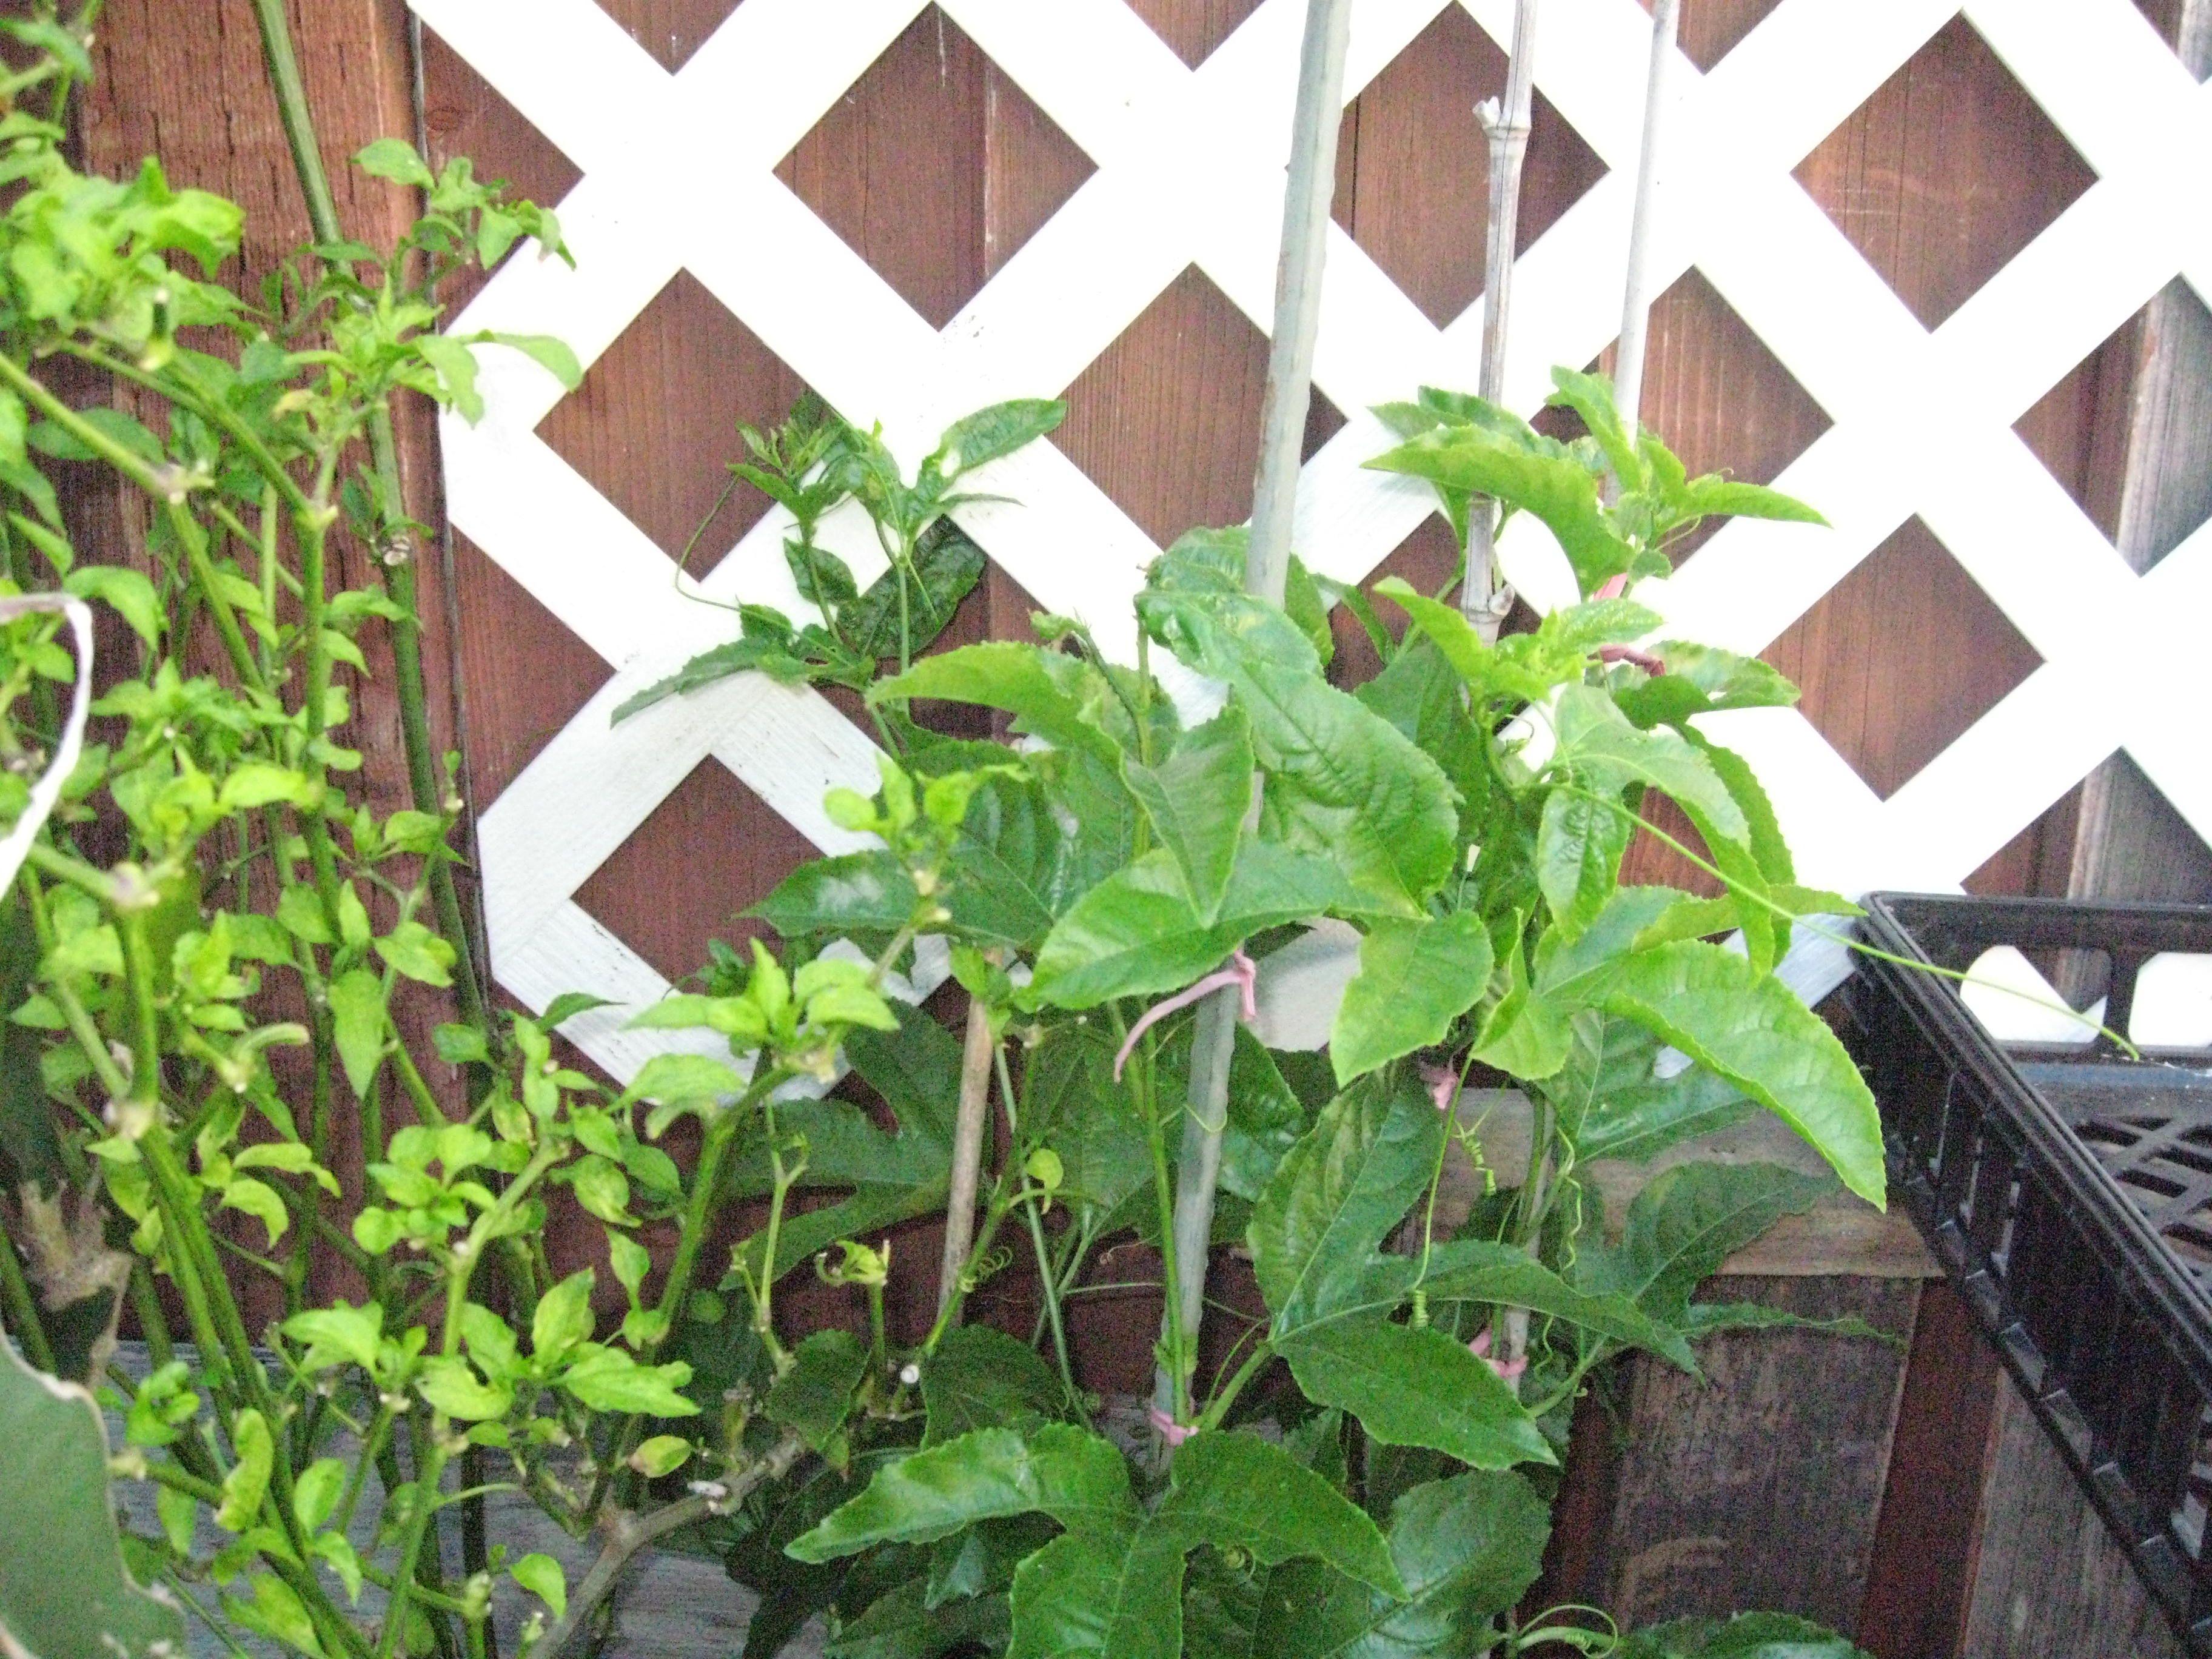 Veggie garden inspiration  Easy Vertical Gardening Ideas for Beginners  Garden  Pinterest